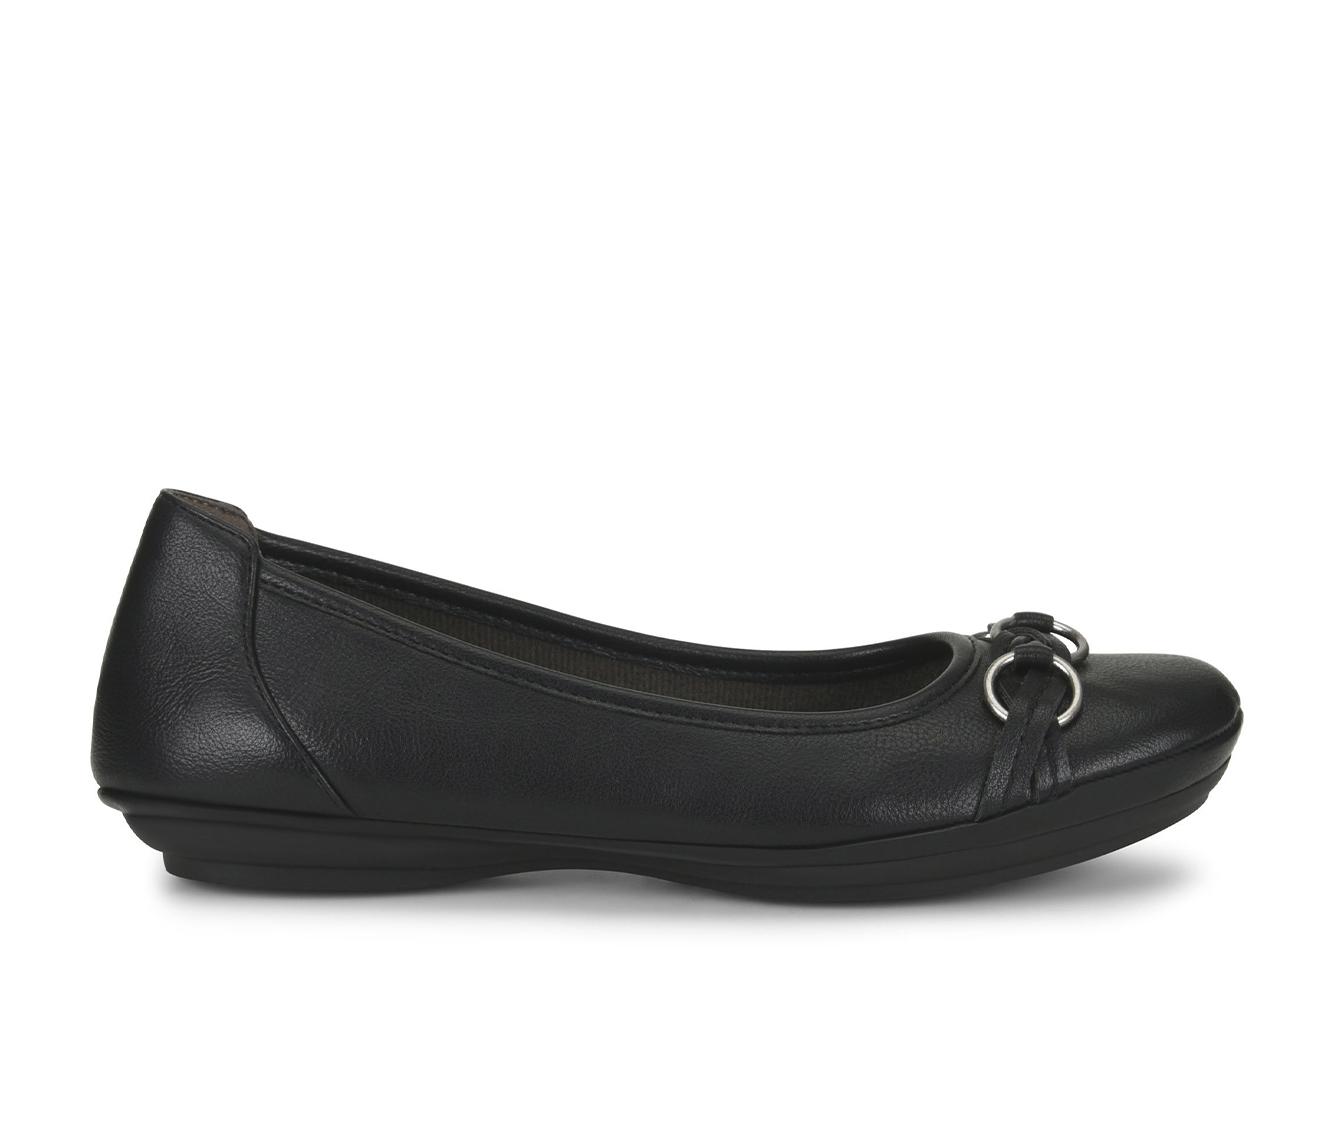 EuroSoft Sabana Women's Shoe (Black Faux Leather)